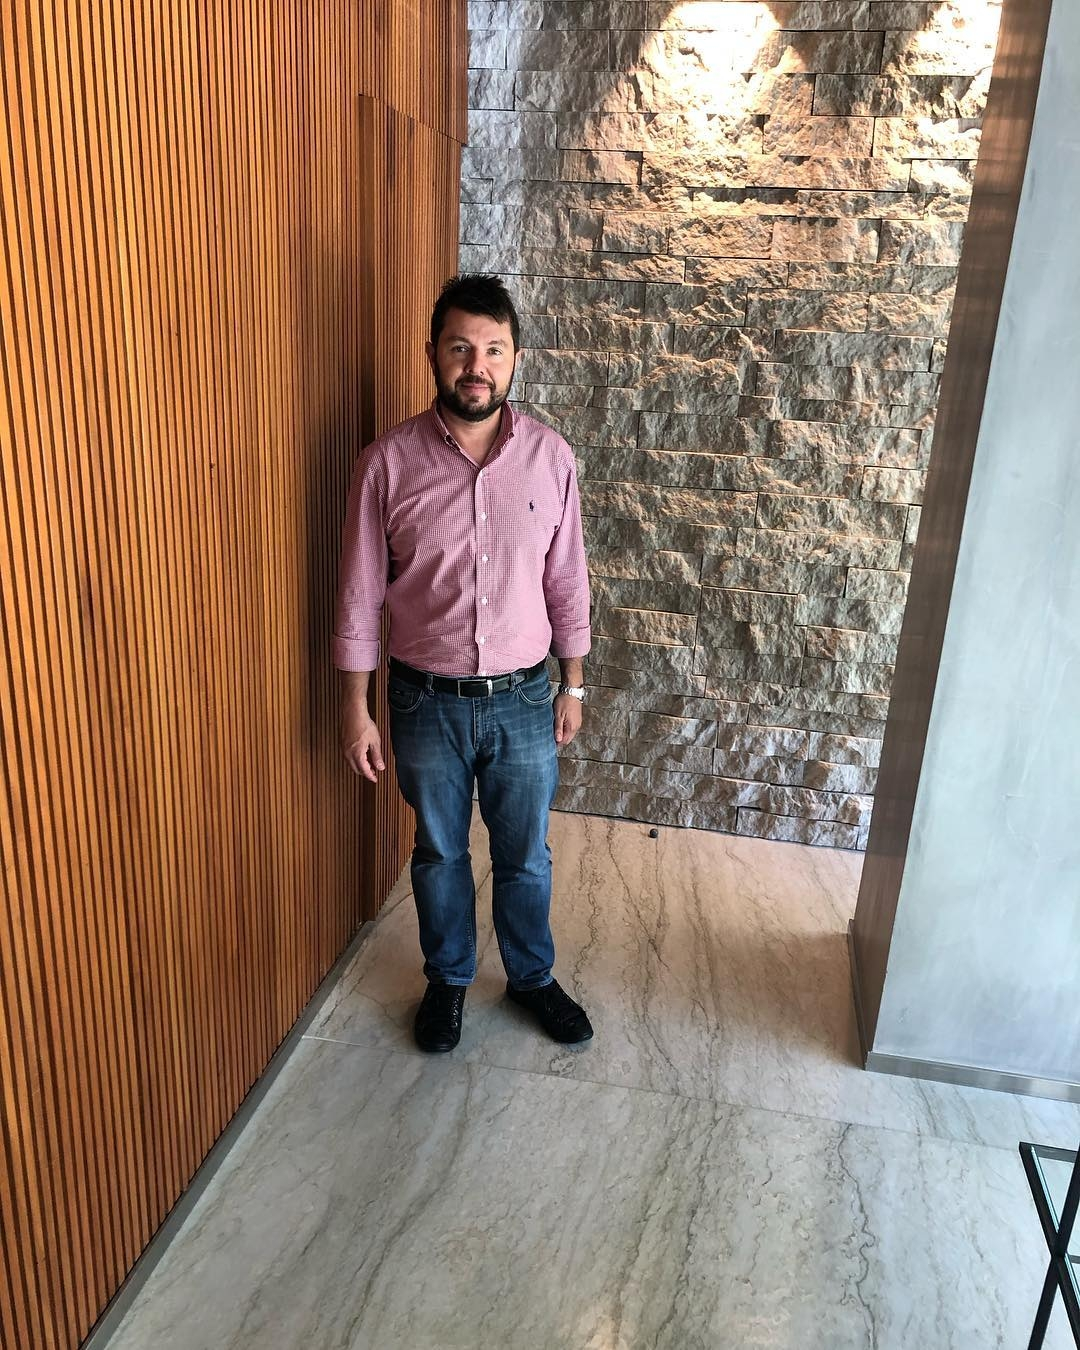 Empreendimento Solar Aimorés tem visita de Deivson Vidal da Toledo Mineração